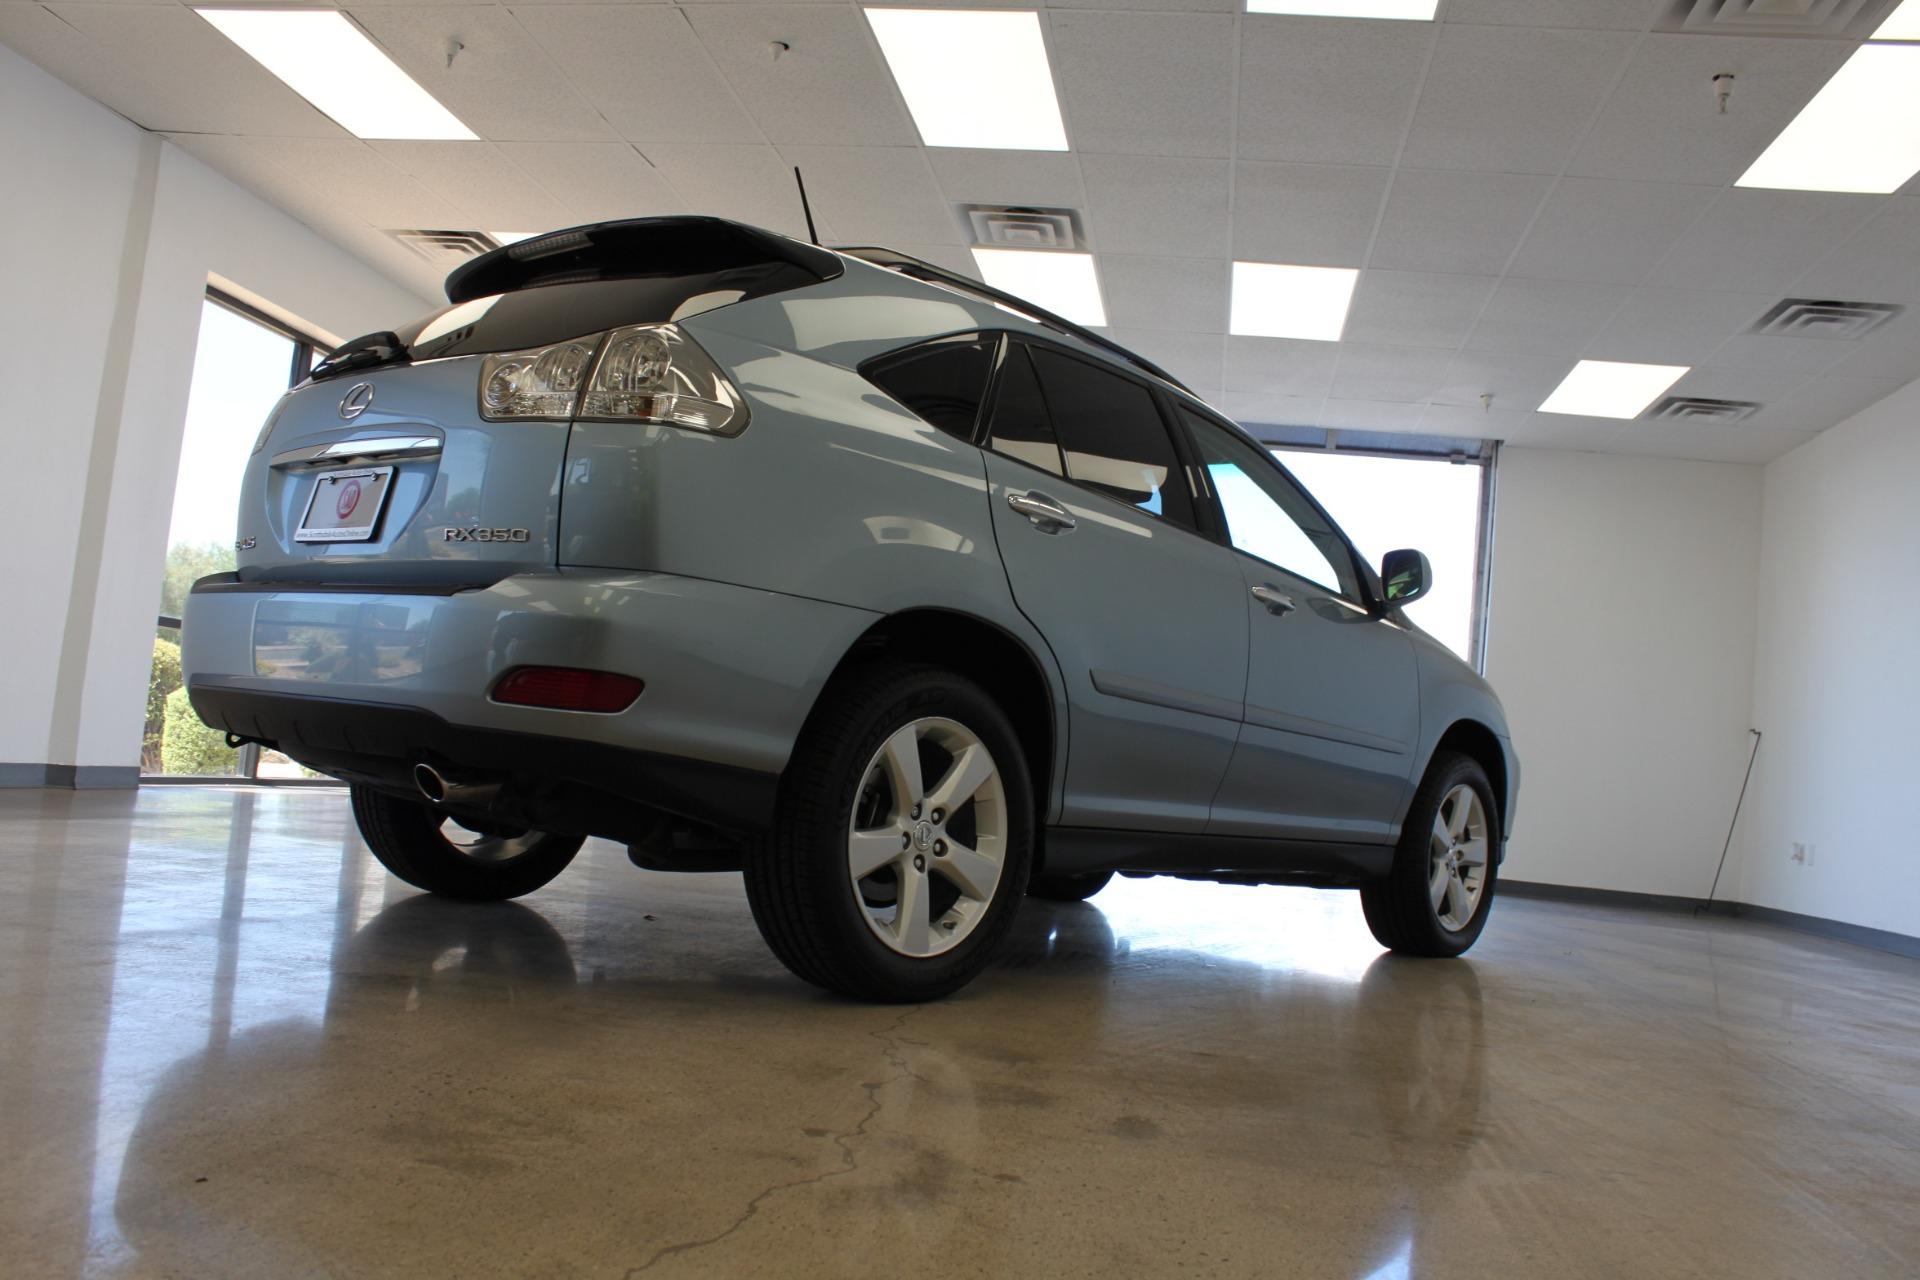 Used-2008-Lexus-RX-350-LS430